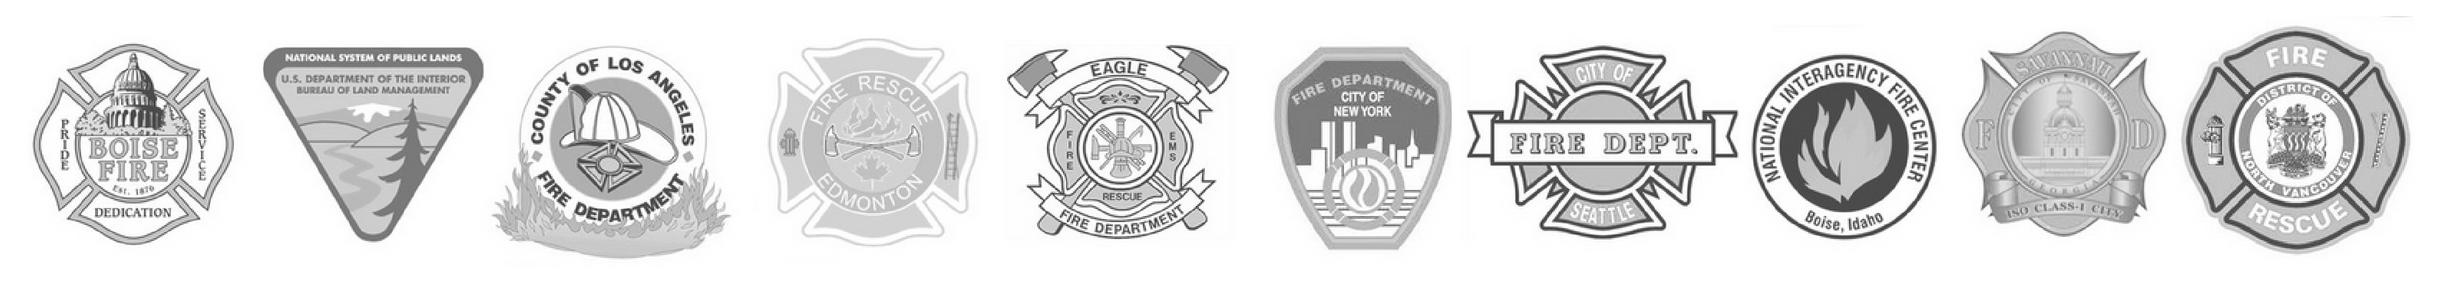 department logos.jpg